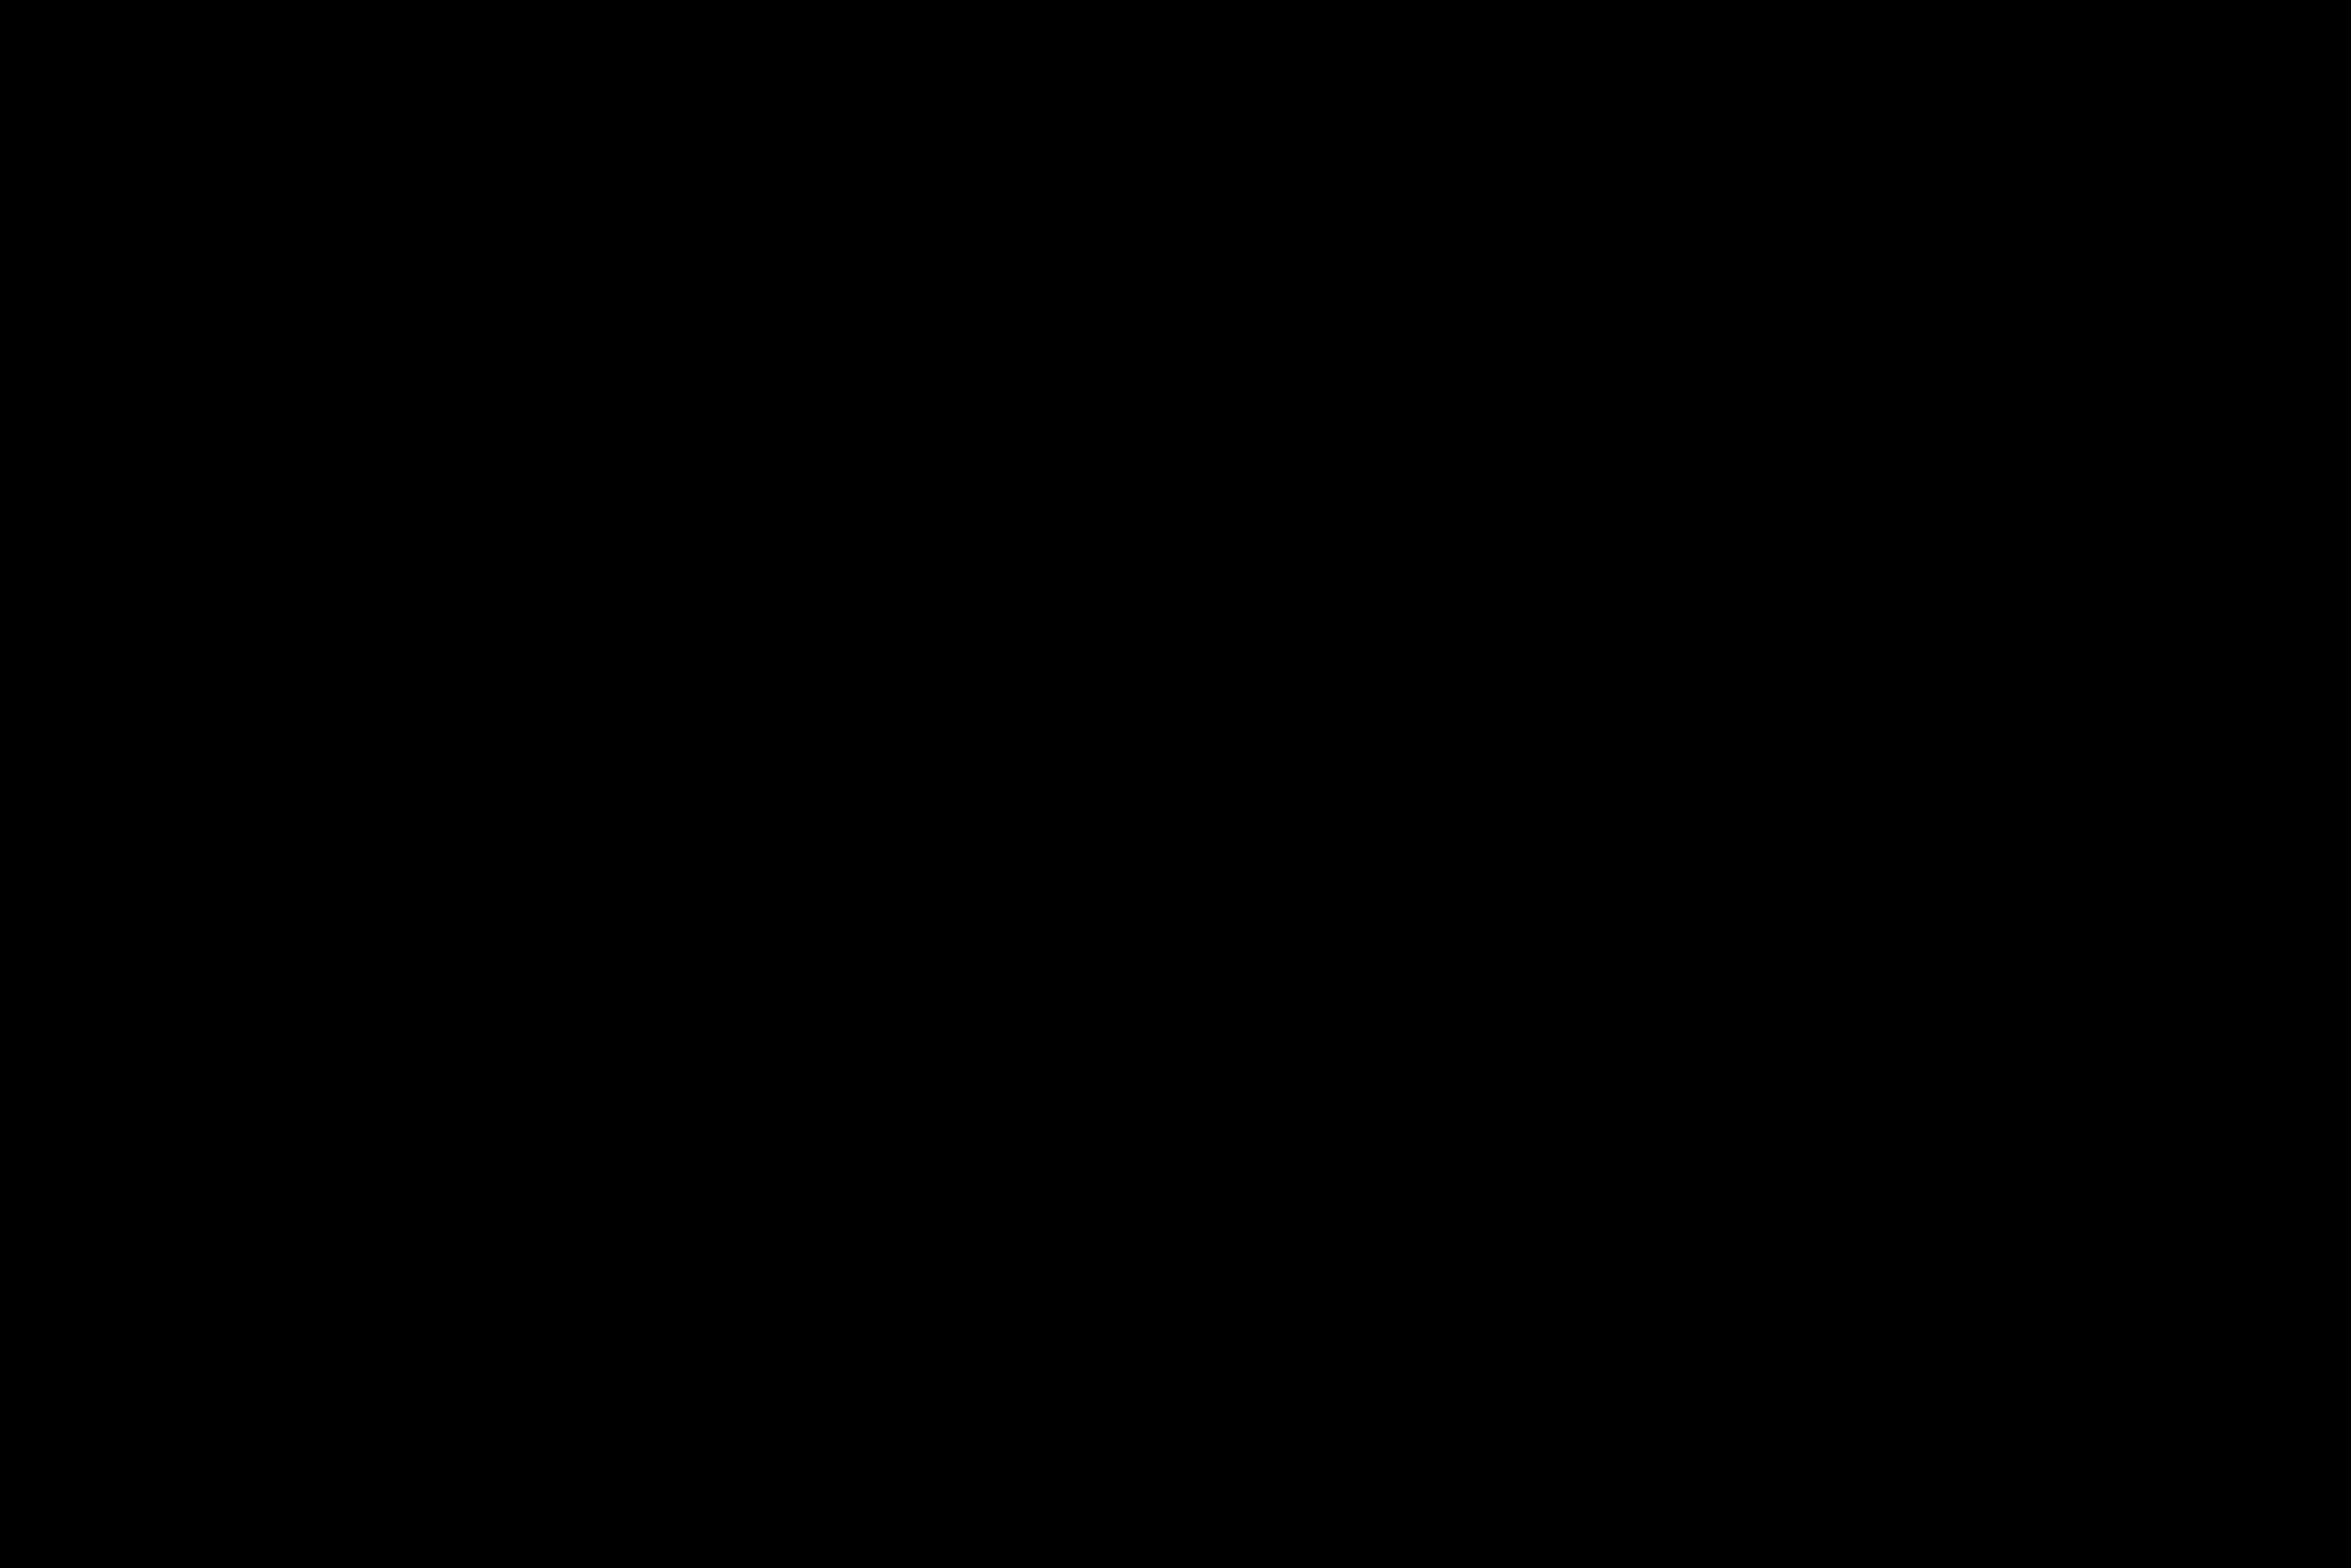 obi-onyeador-656518-unsplash-flip